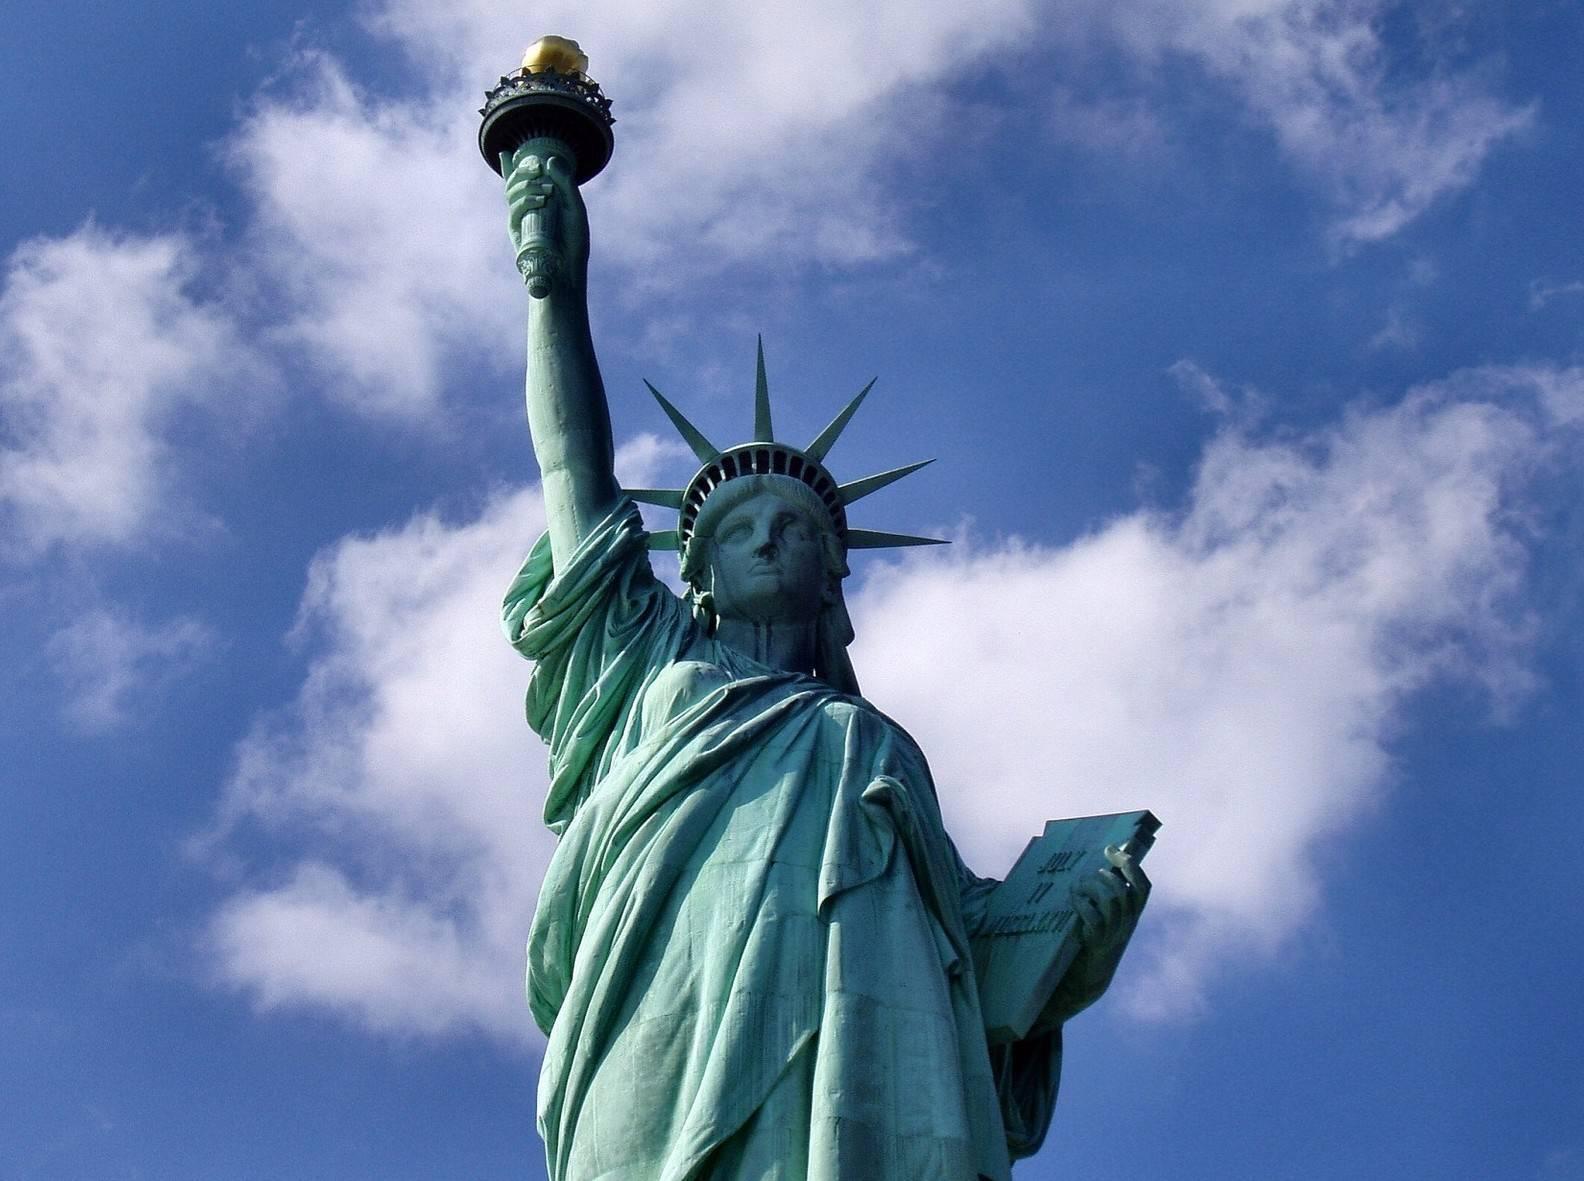 e65573dc93d2e8829866_statue-of-liberty-1045266_1920.jpg